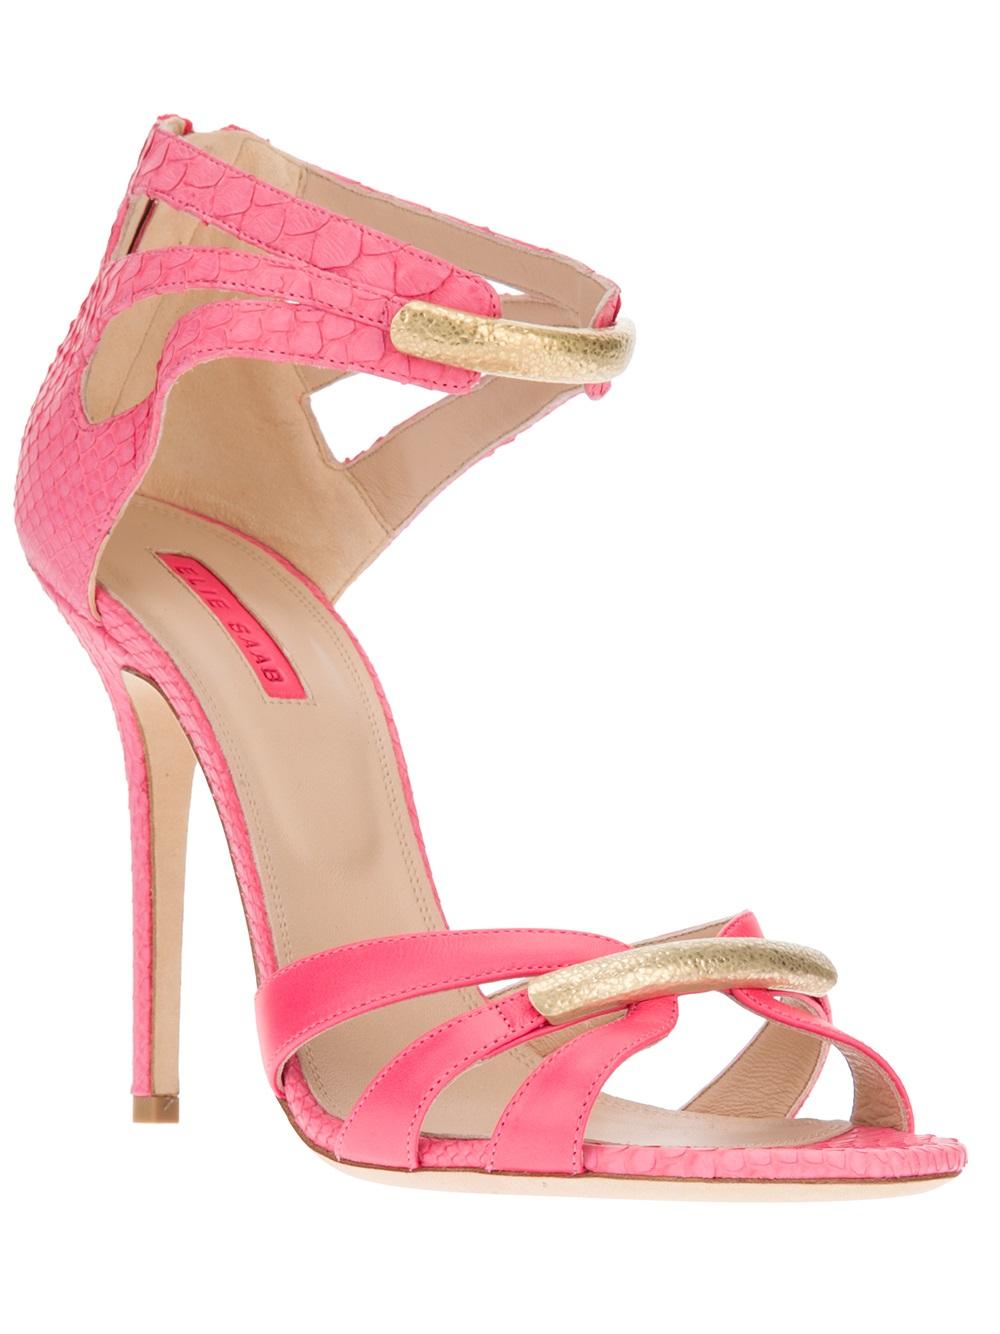 Lyst - Elie Saab Strappy Sandal In Pink-8256